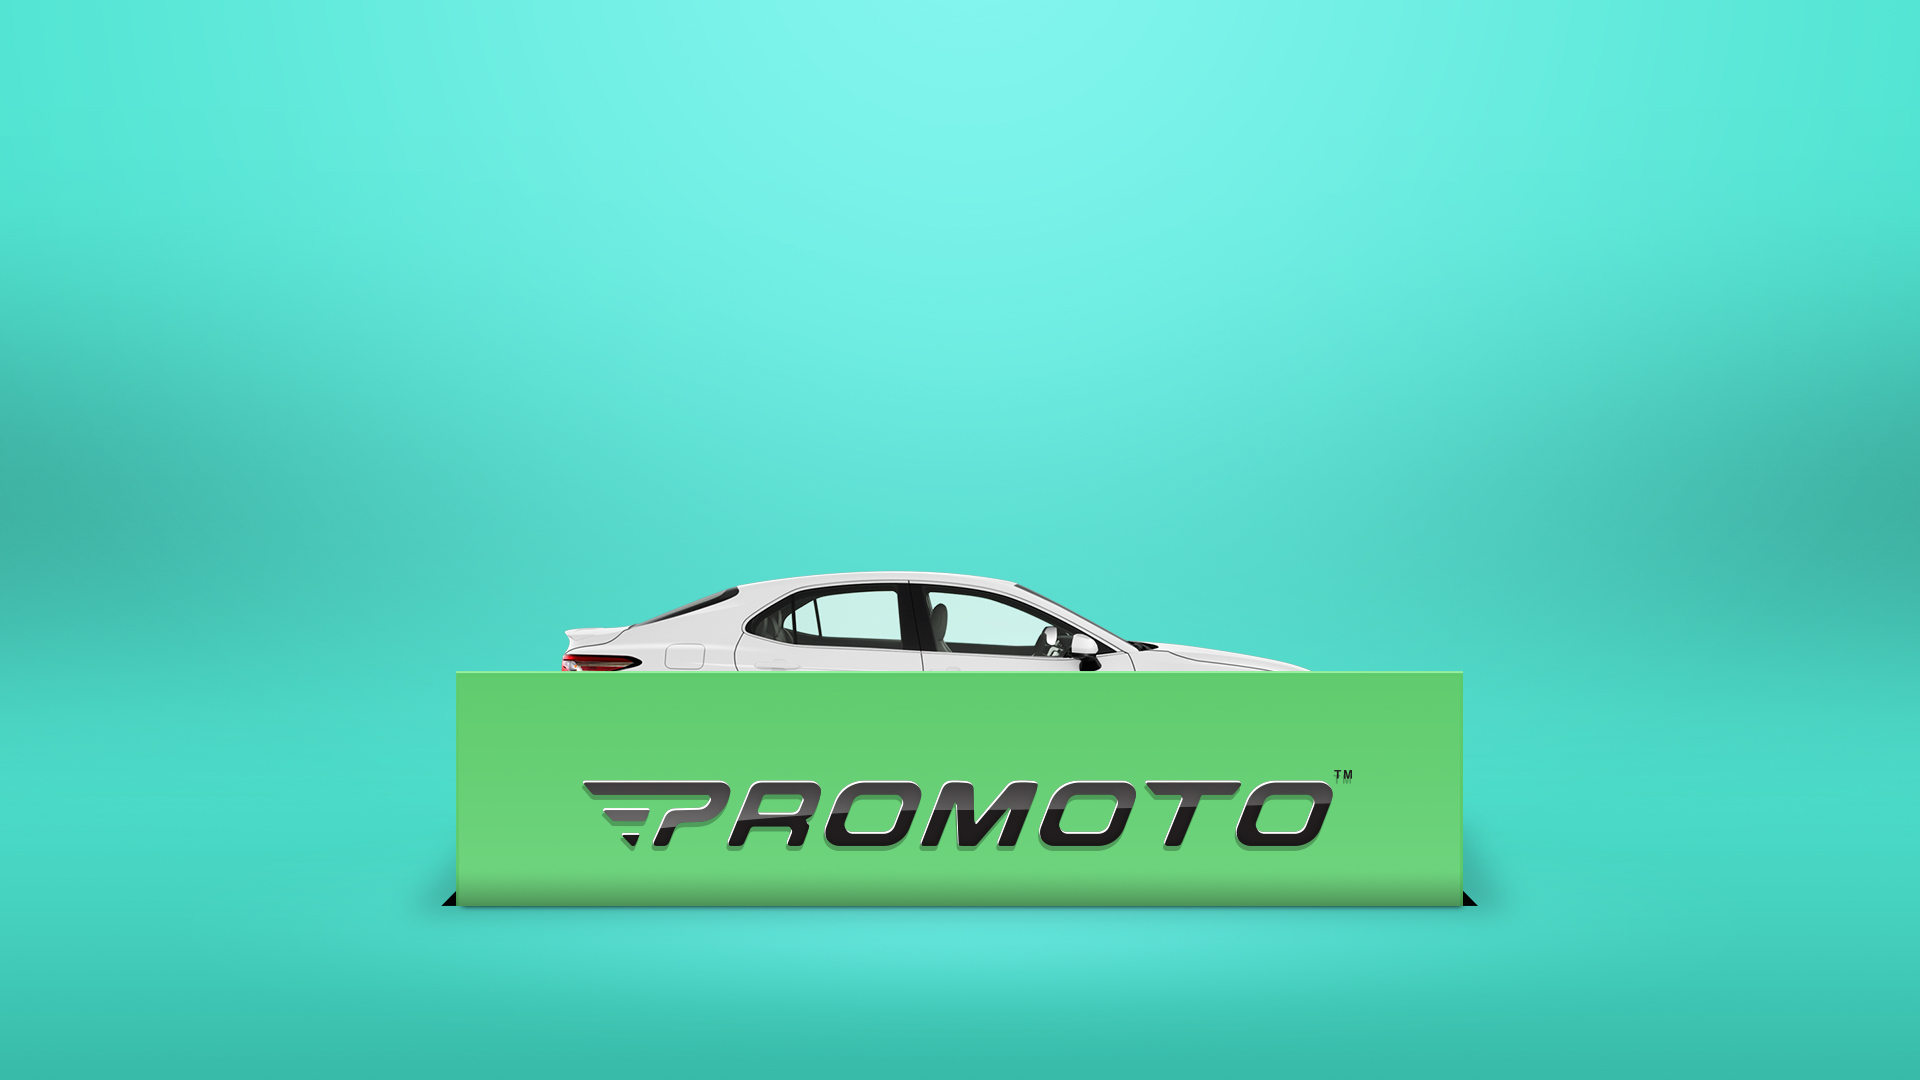 Promoto_A_04.jpg